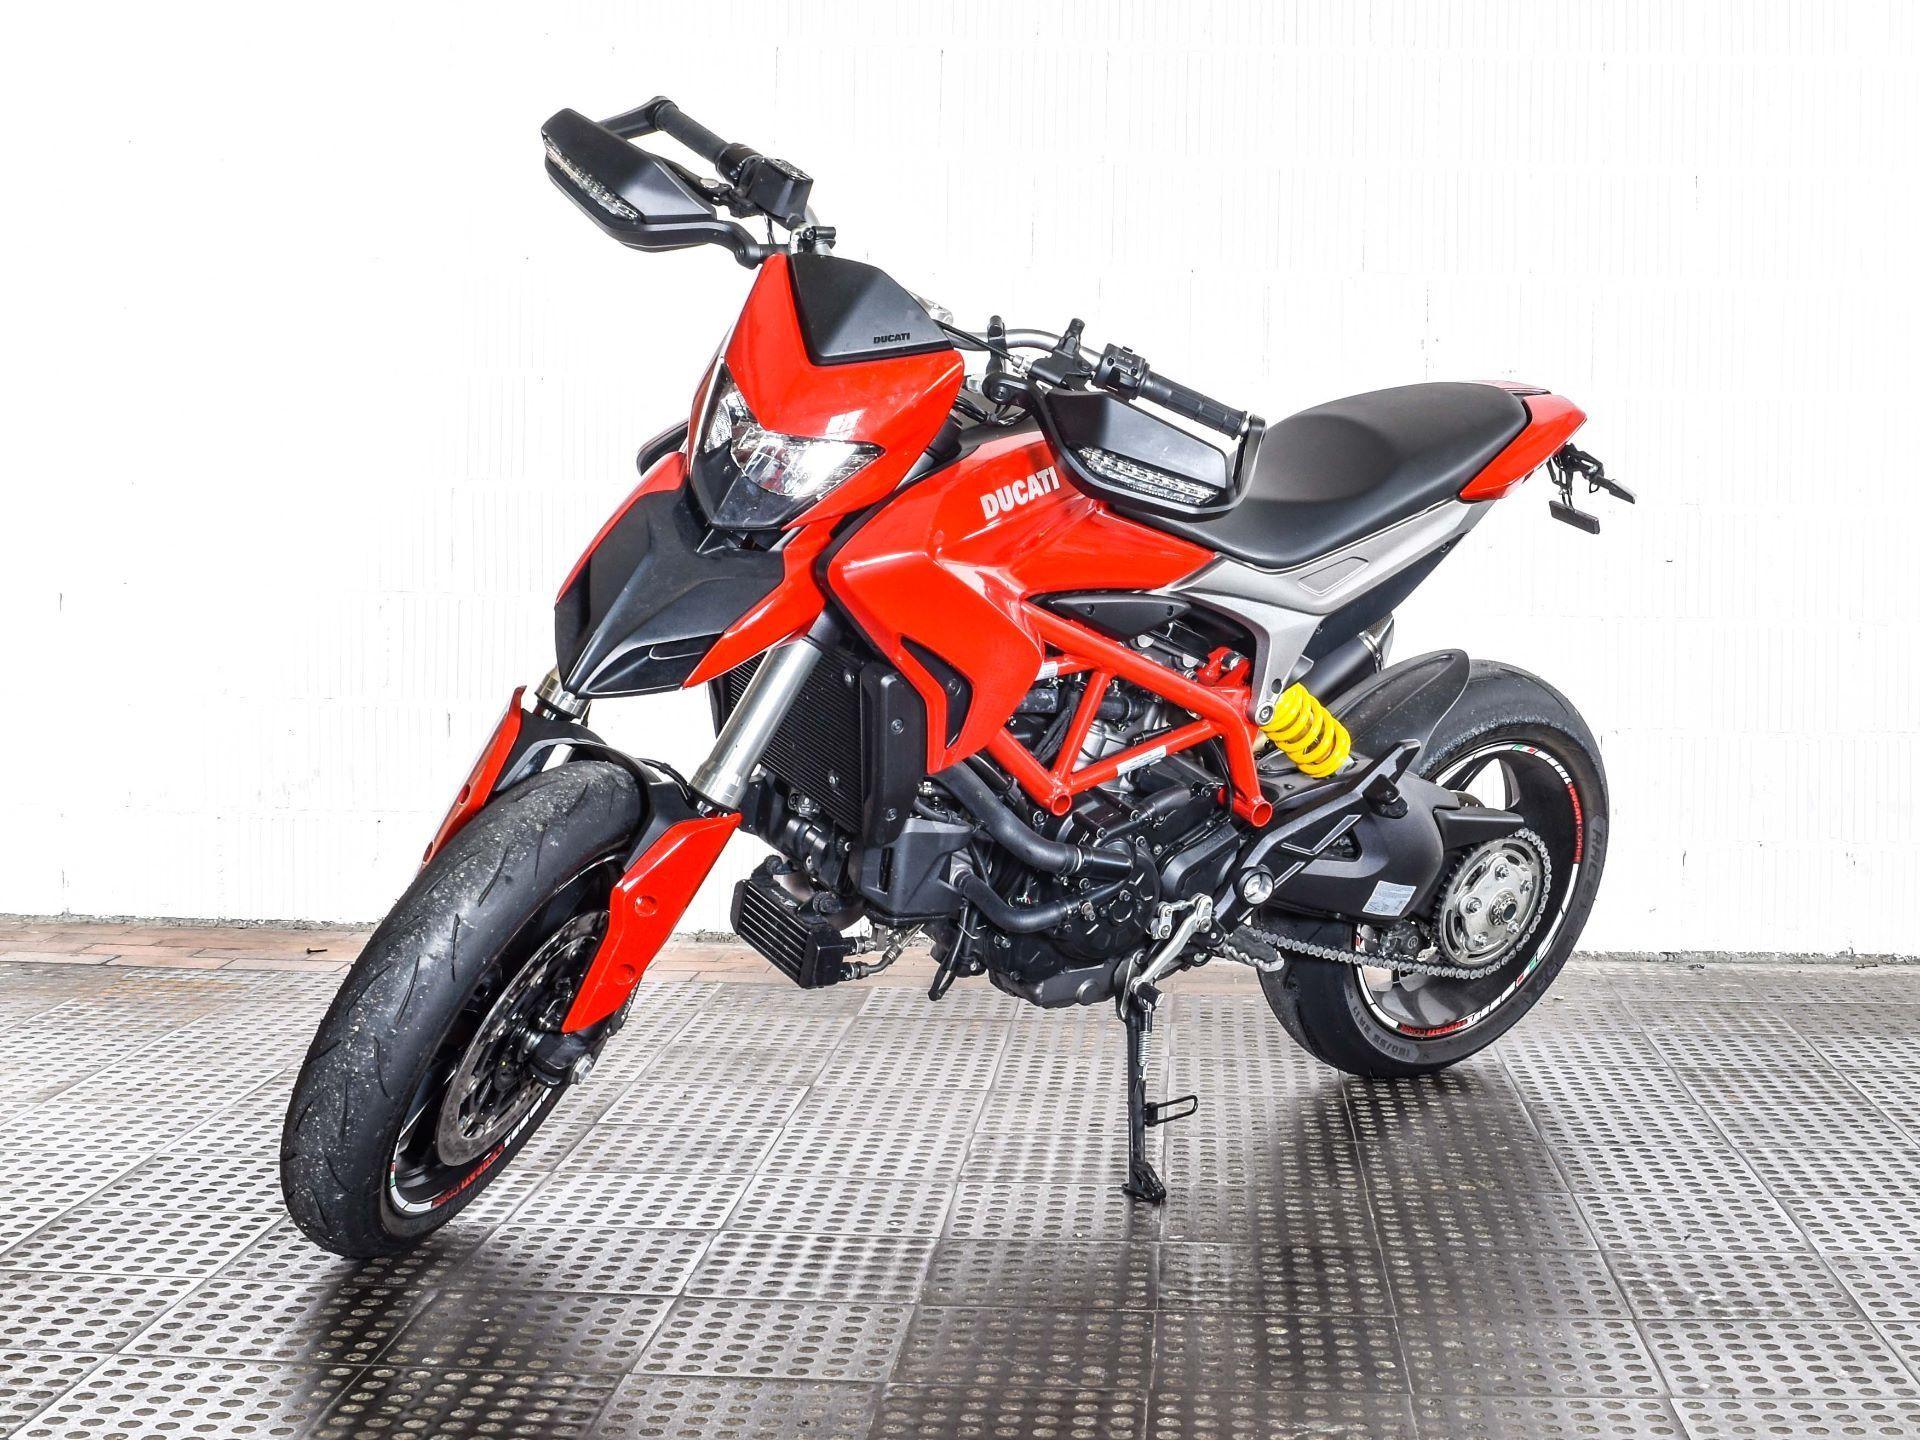 motorrad occasion kaufen ducati 939 hypermotard abs motocenter seetal ballwil. Black Bedroom Furniture Sets. Home Design Ideas